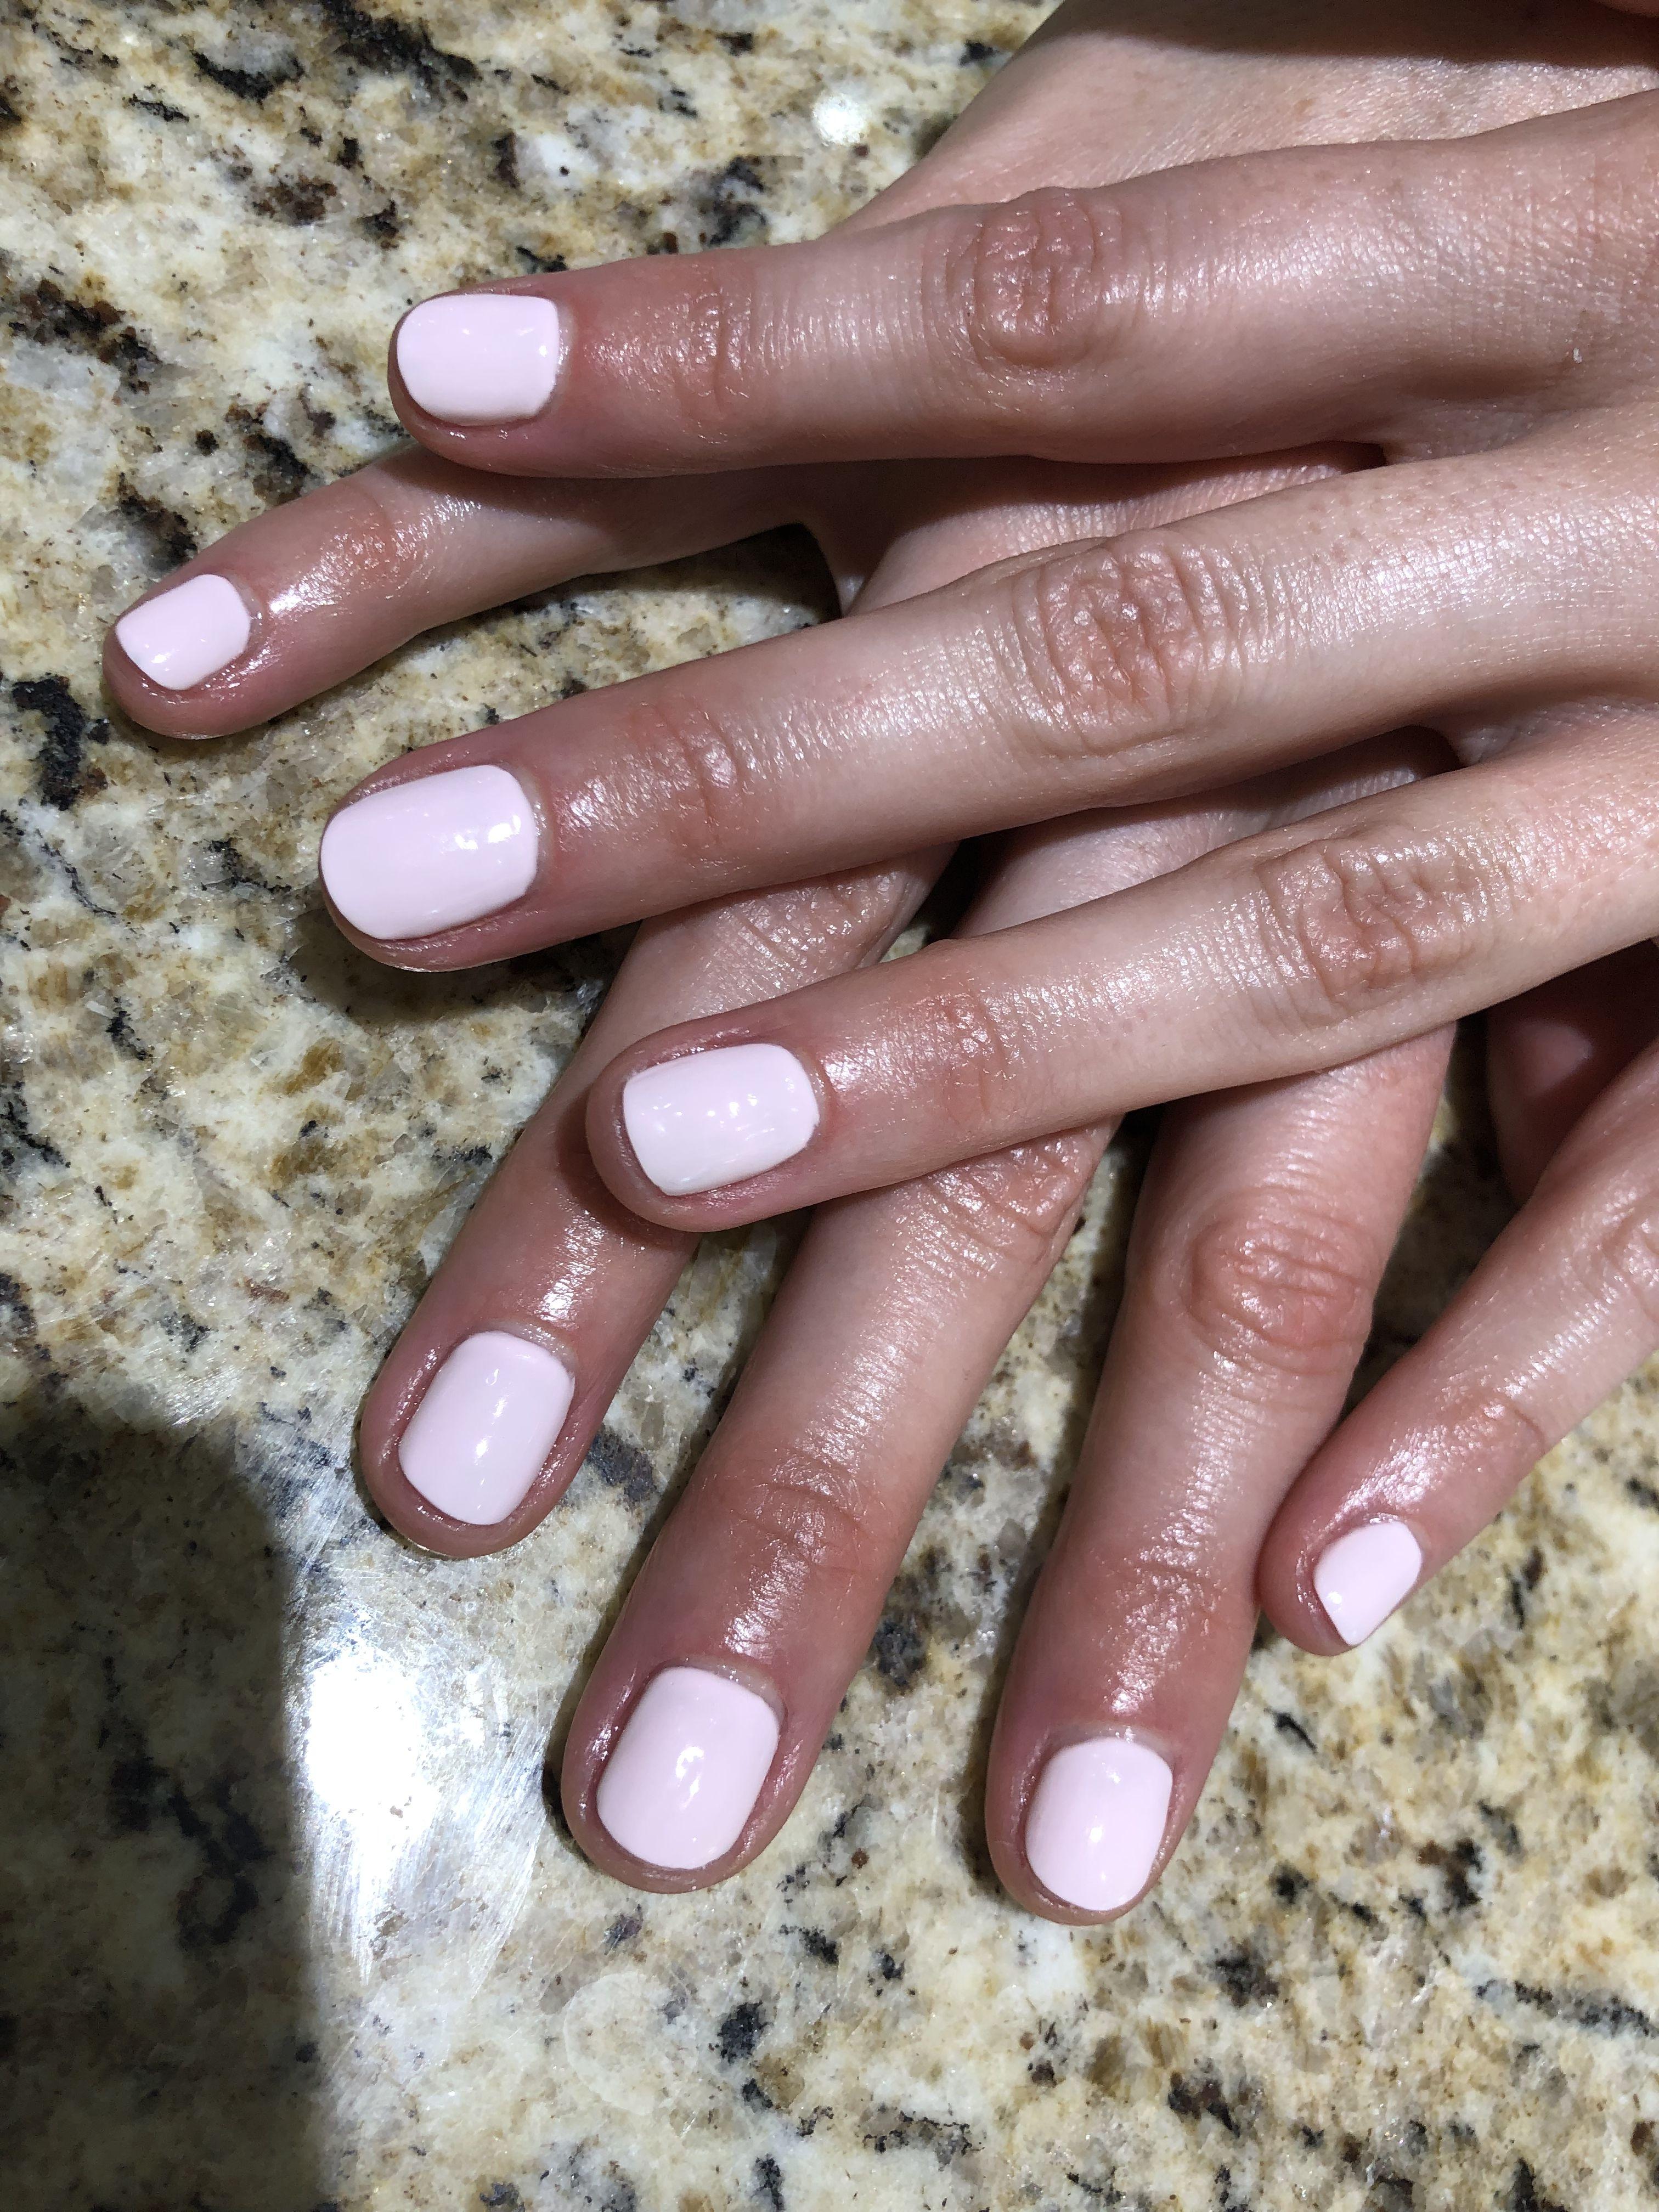 The Simple Life By Kiara Sky Gelcolor Urbannailsbar Gelnails Gelmani Gelpolish Kiarasky Kiaraskynails Urban Nails Nails Blue Nail Polish